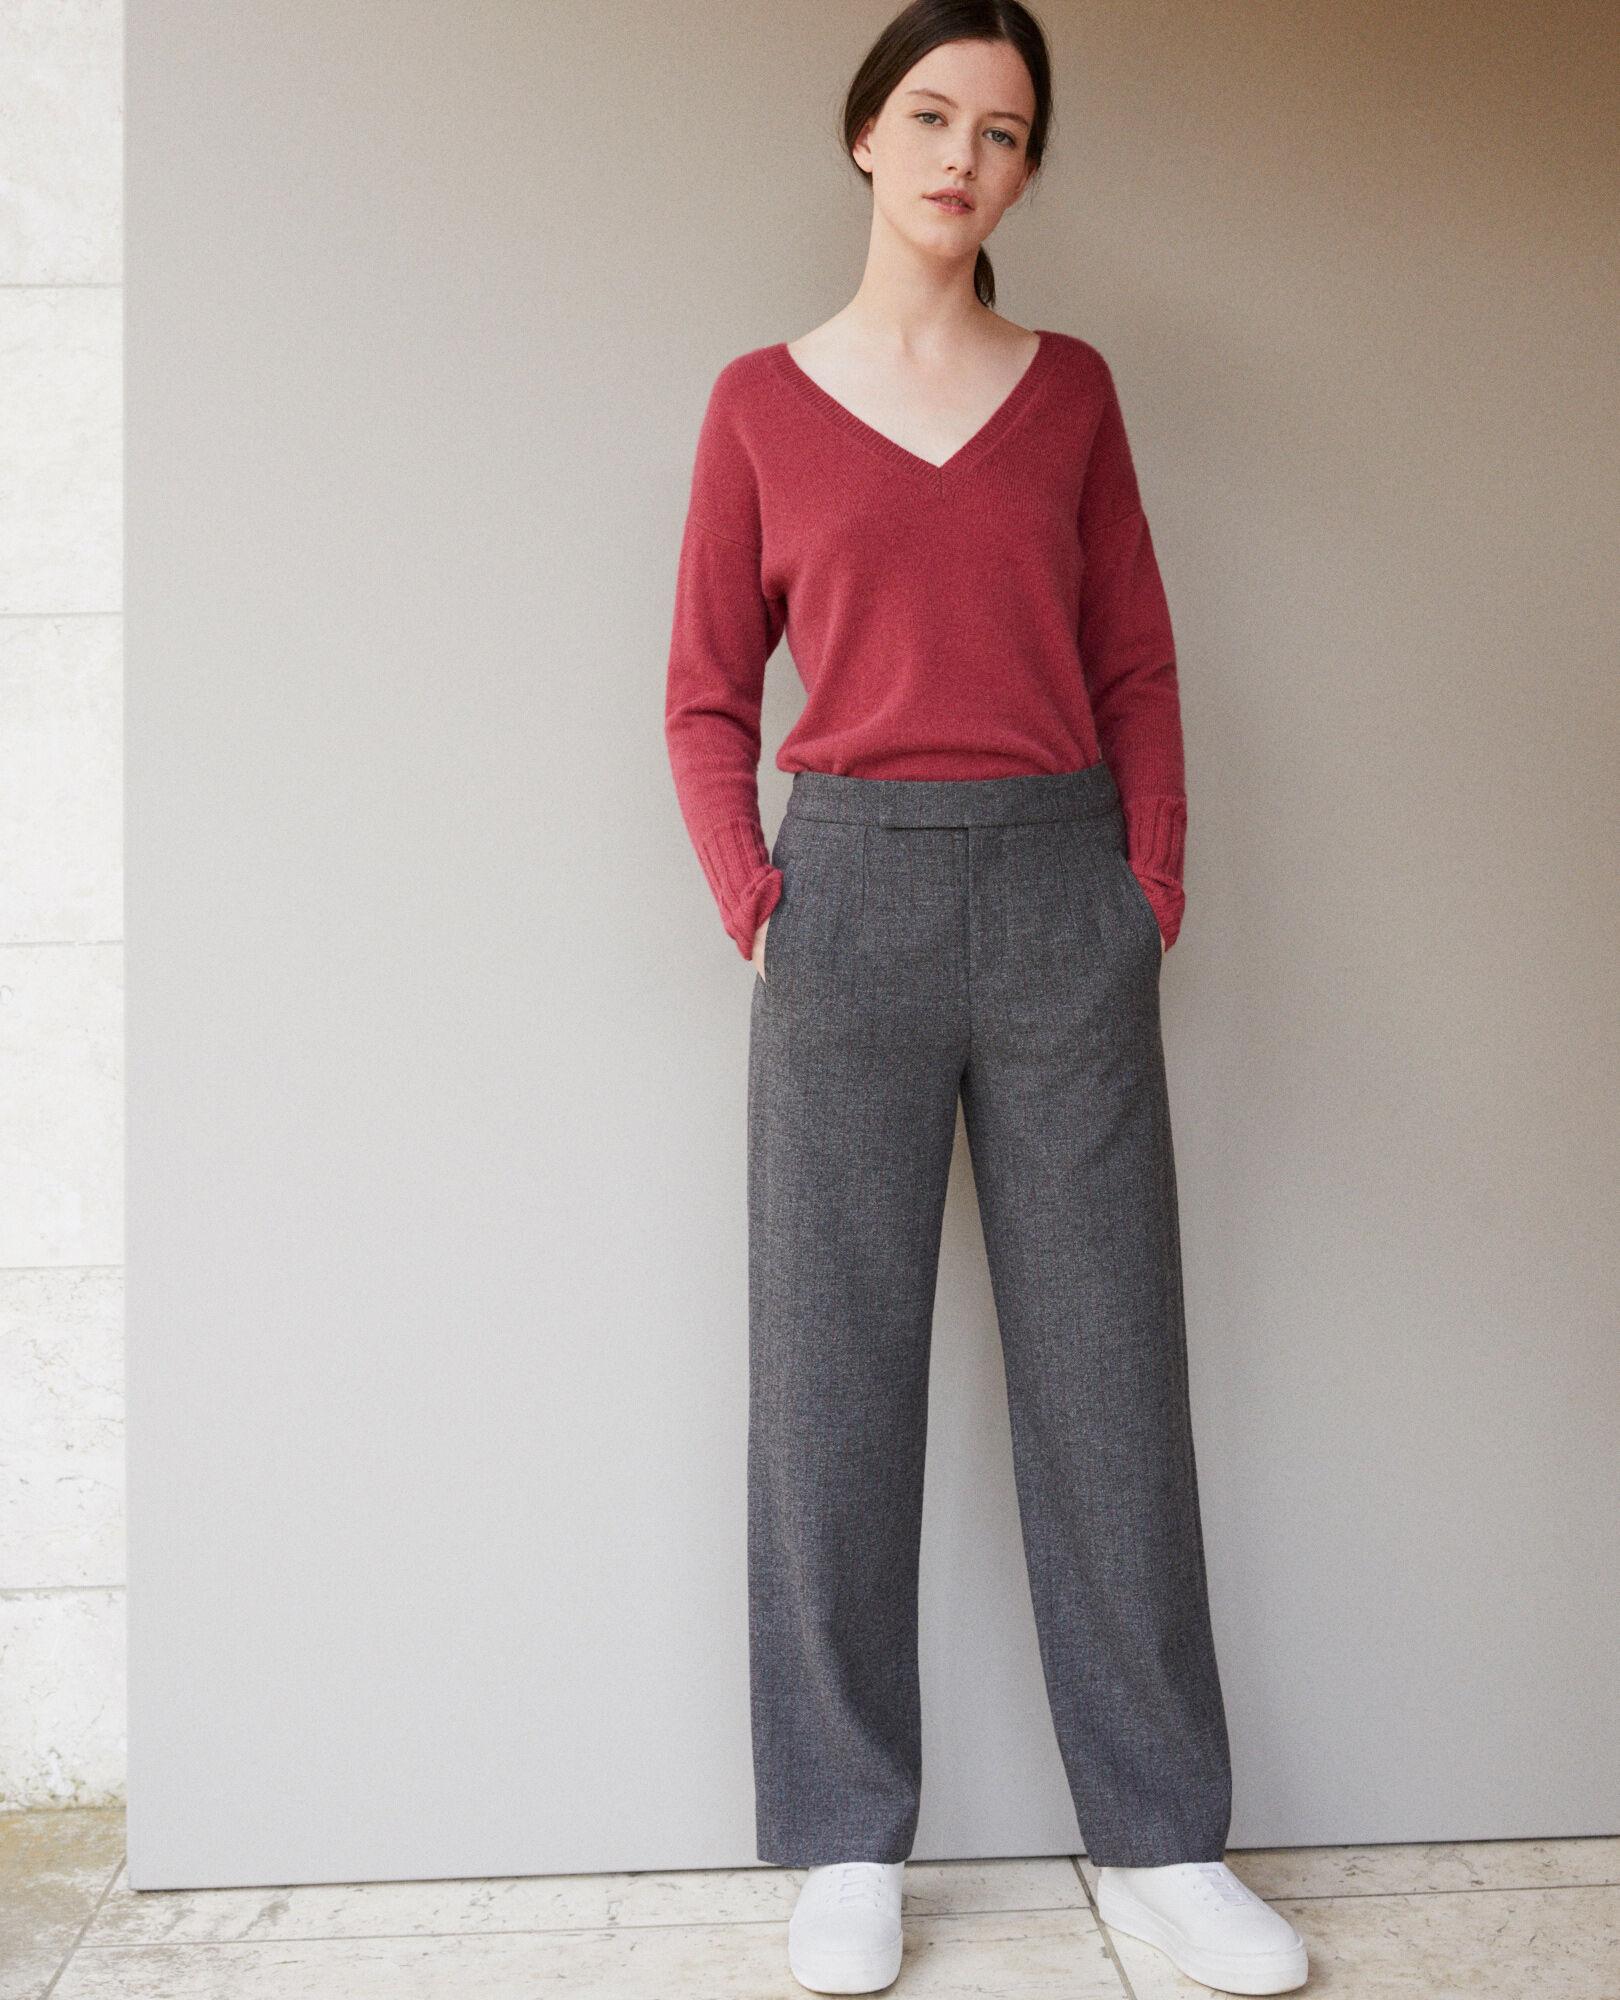 Gylopa Épais Grey Heather Femme Comptoir Dark Pantalon Couleur PY6APx